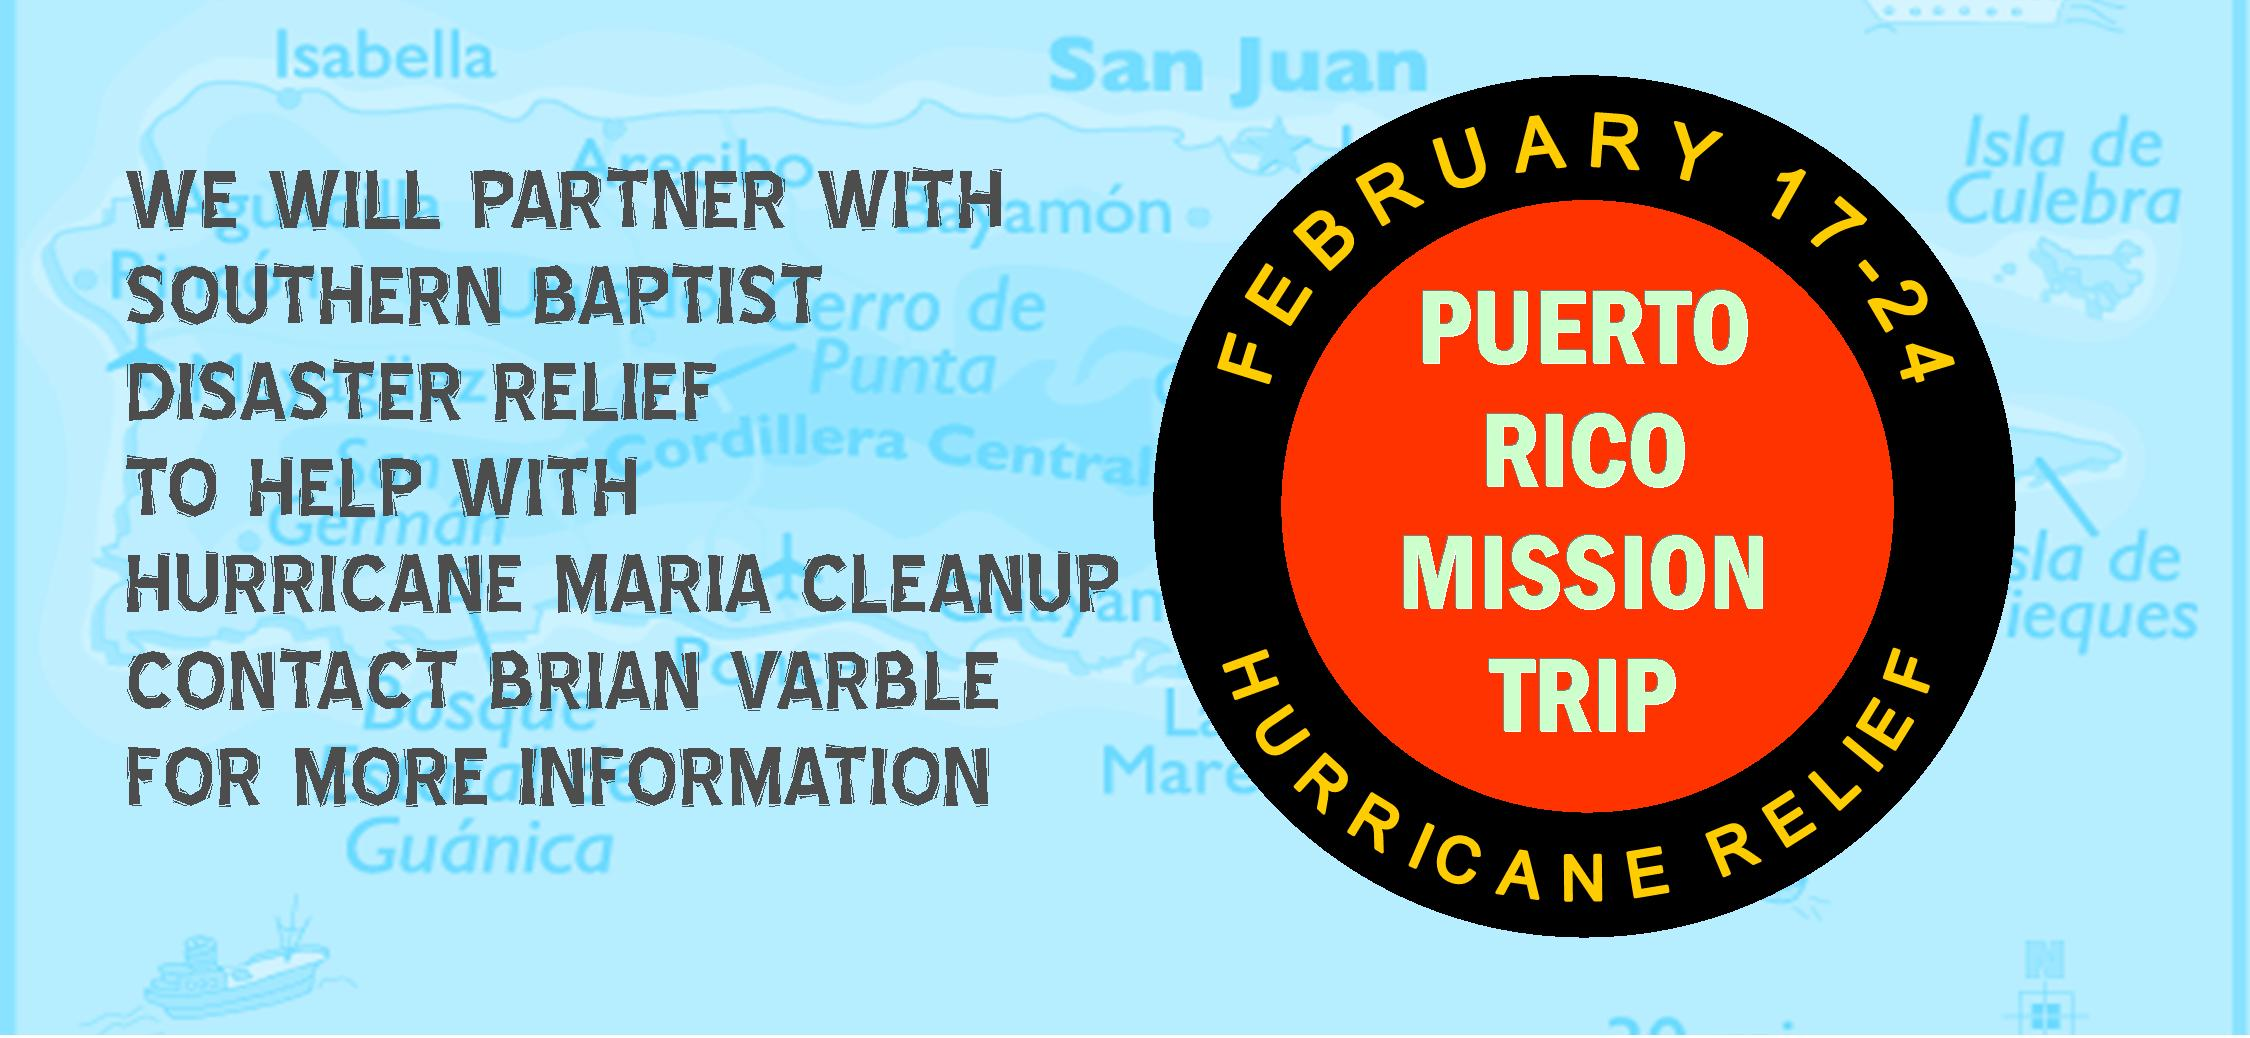 Puerto Rico Mission Trip Mtg 121817.jpg